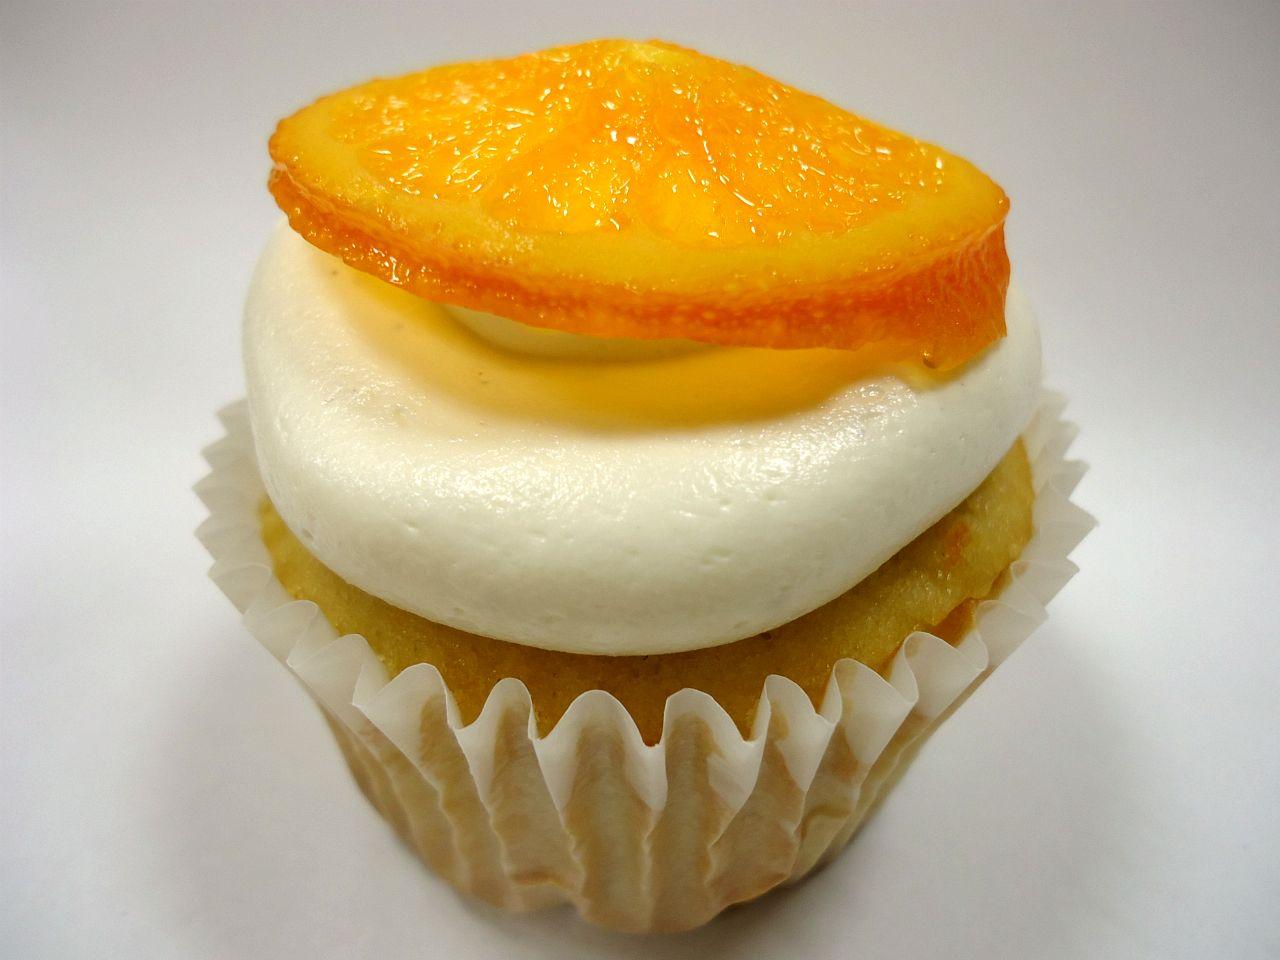 The Beachside Baker: Orange Vanilla Bean Cupcakes